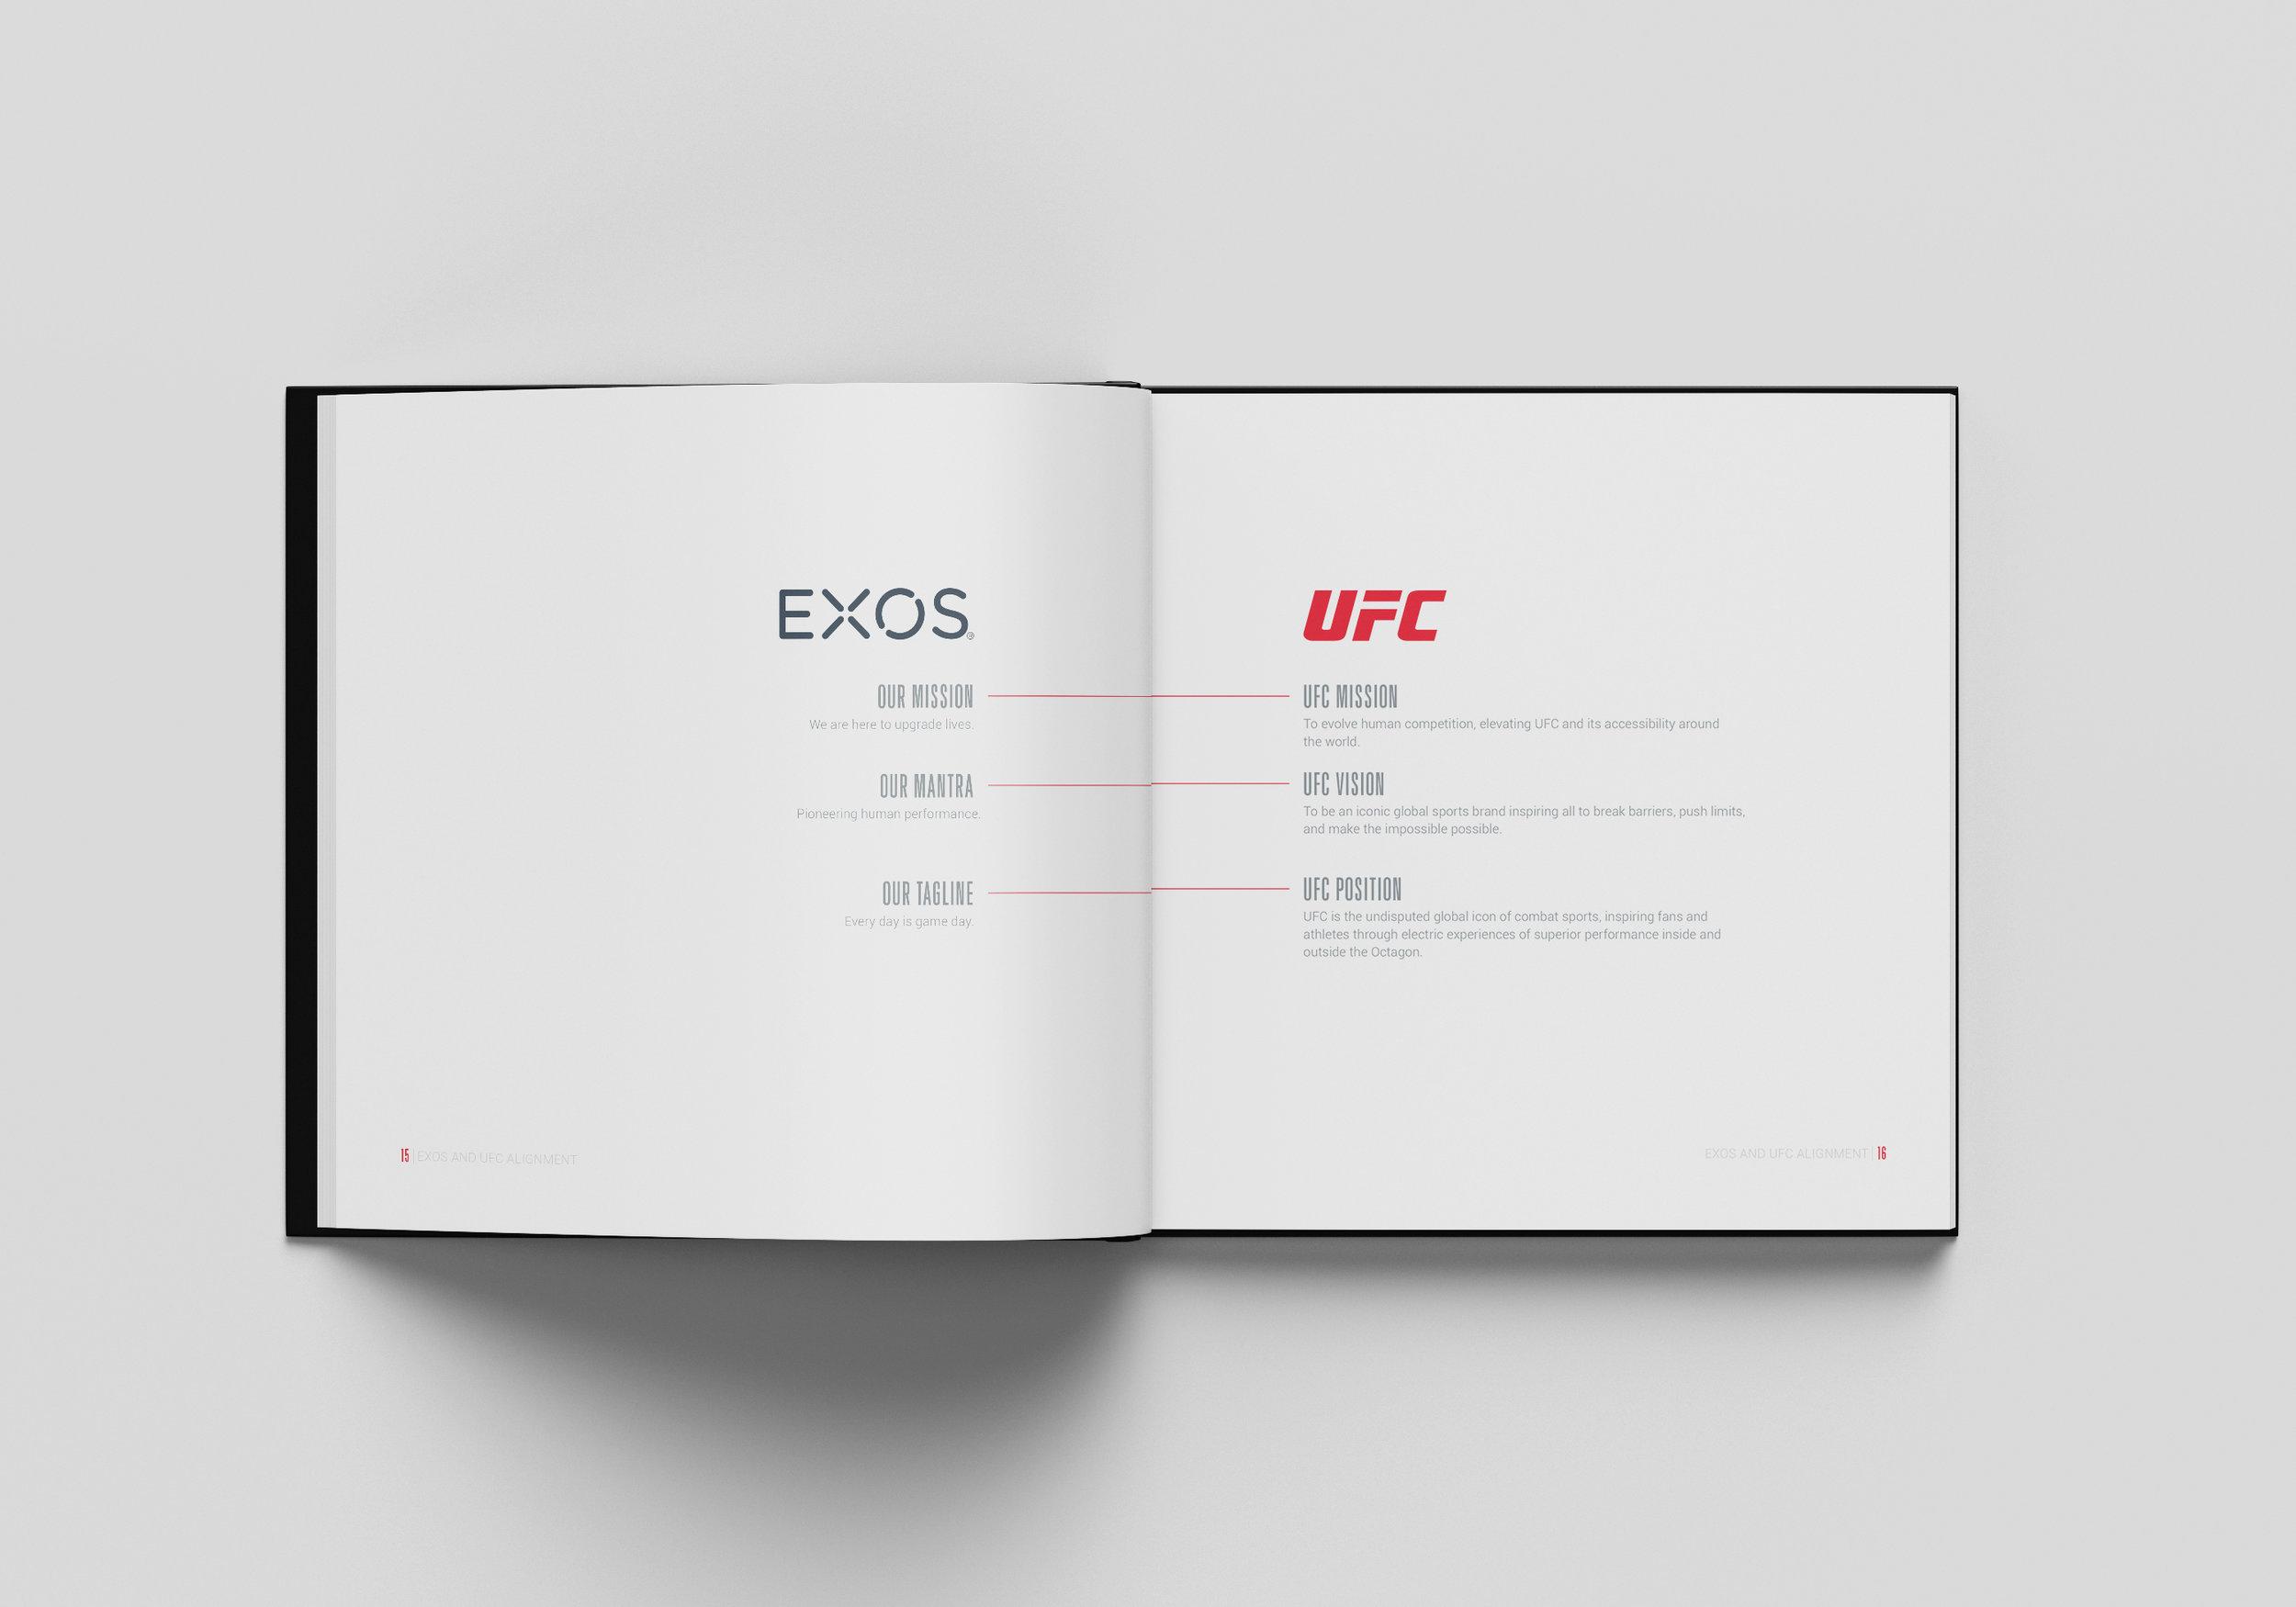 EXOS_UFC_Book_Spreads_Alignment.jpg